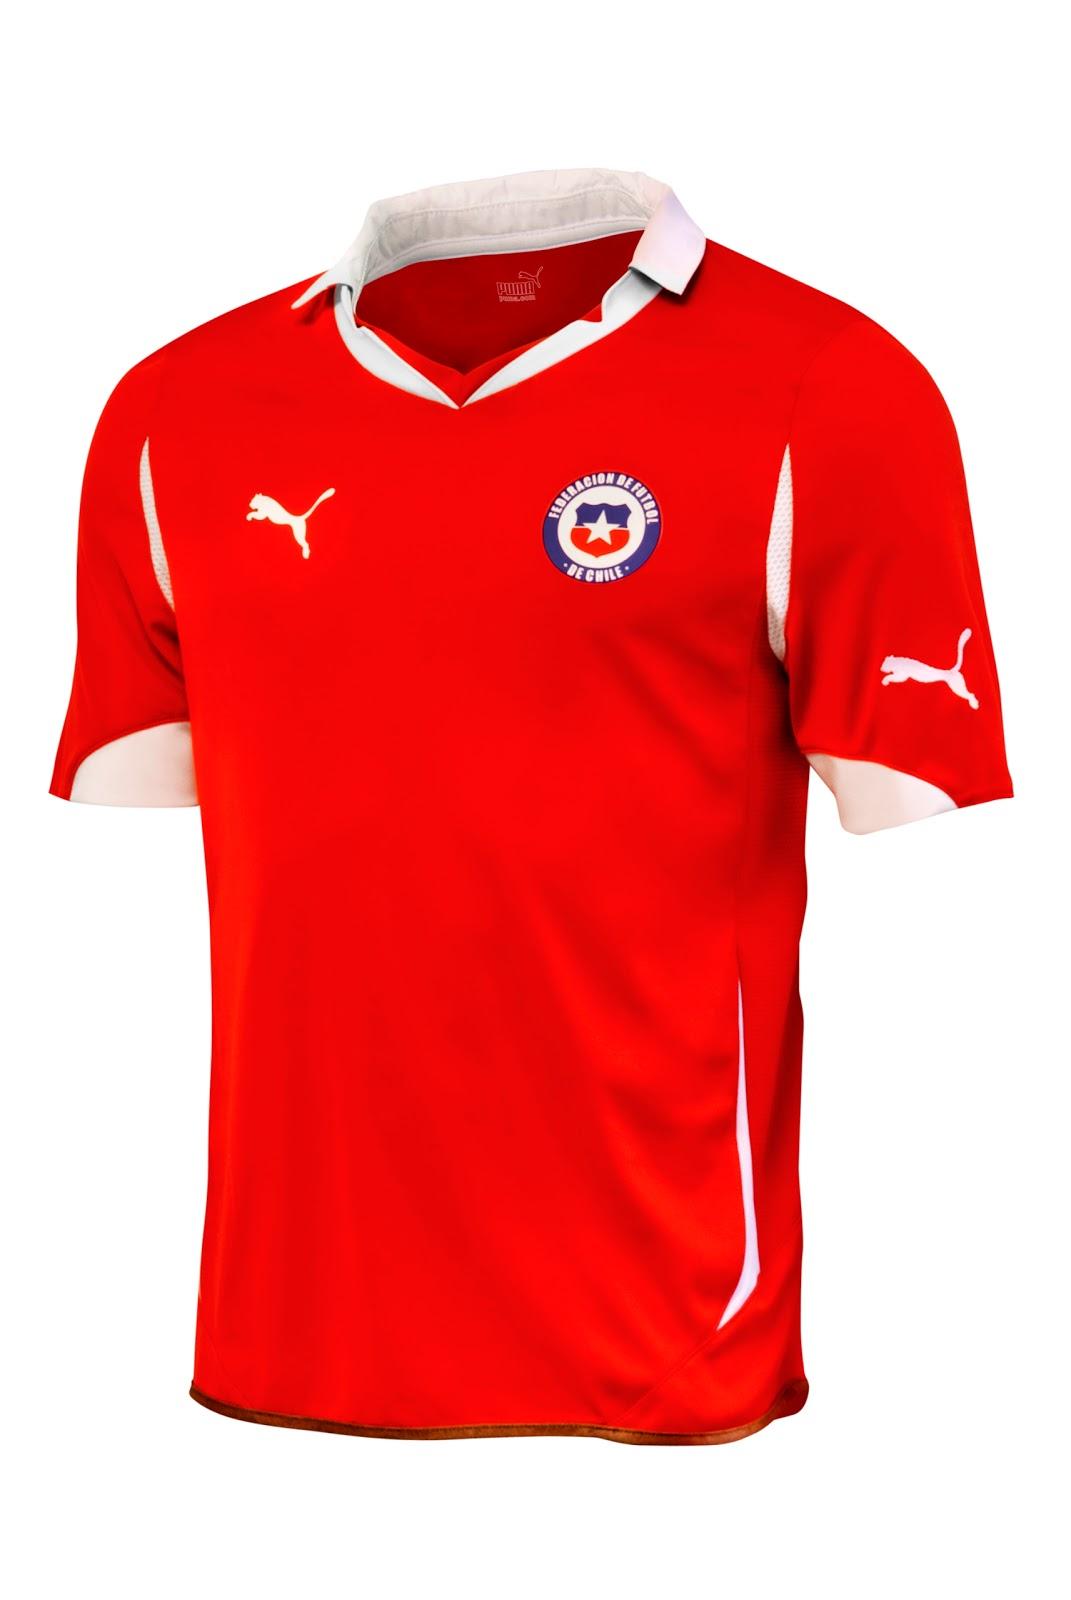 Segunda equipación / uniforme / camiseta Chile blanca puma 2012/2013